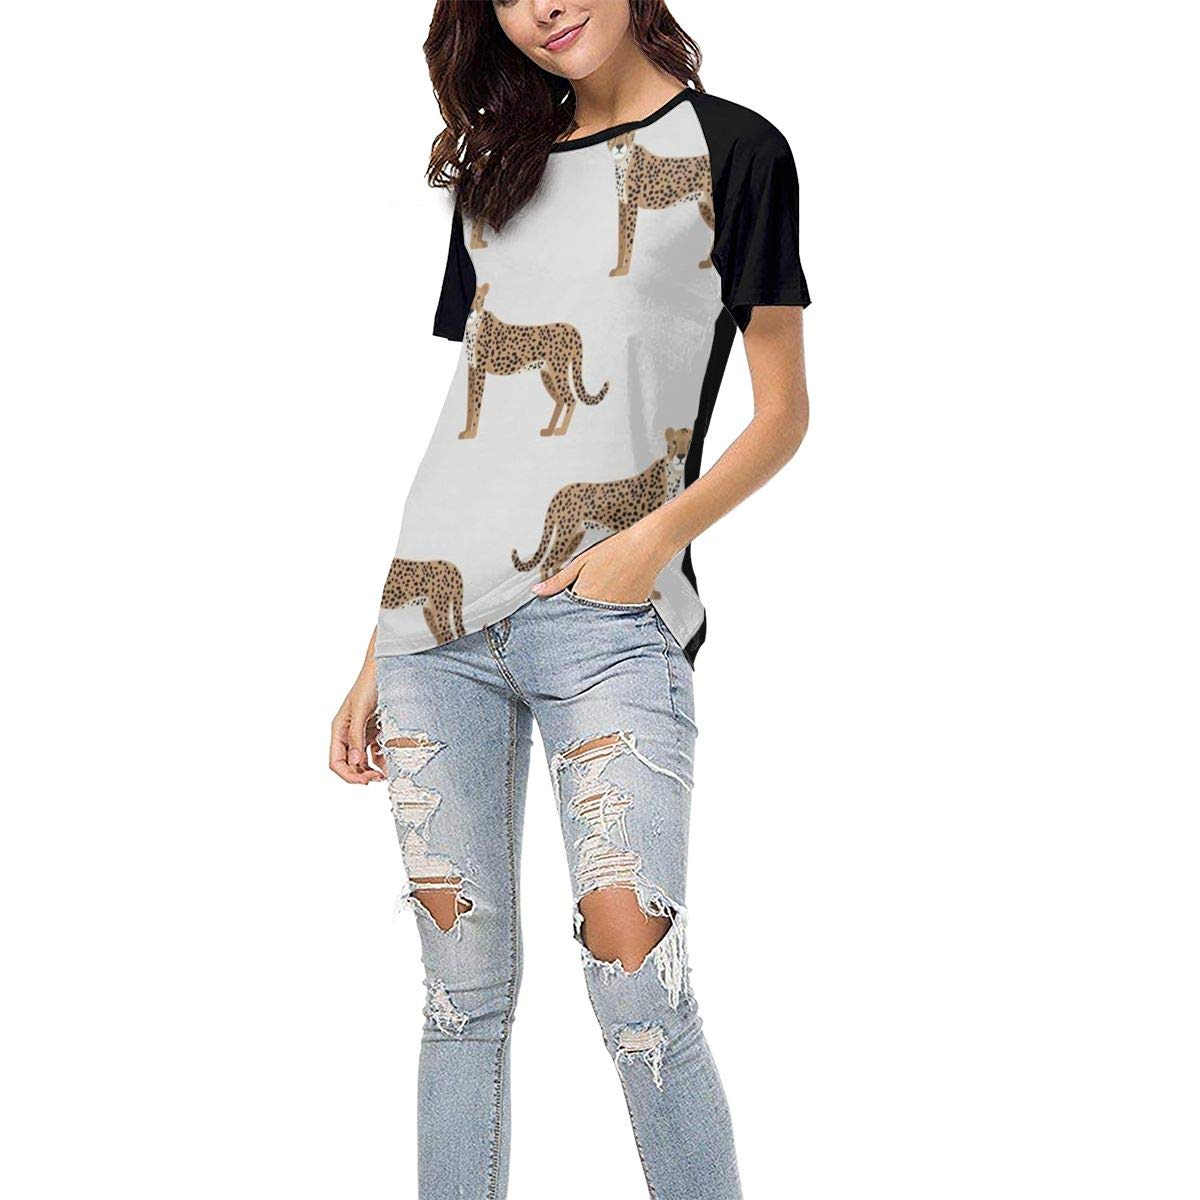 QWXZC Leopard Womens Short Sleeves Baseball Tee Casual Raglan Shirt Baseball Raglan T-Shirt.Black.